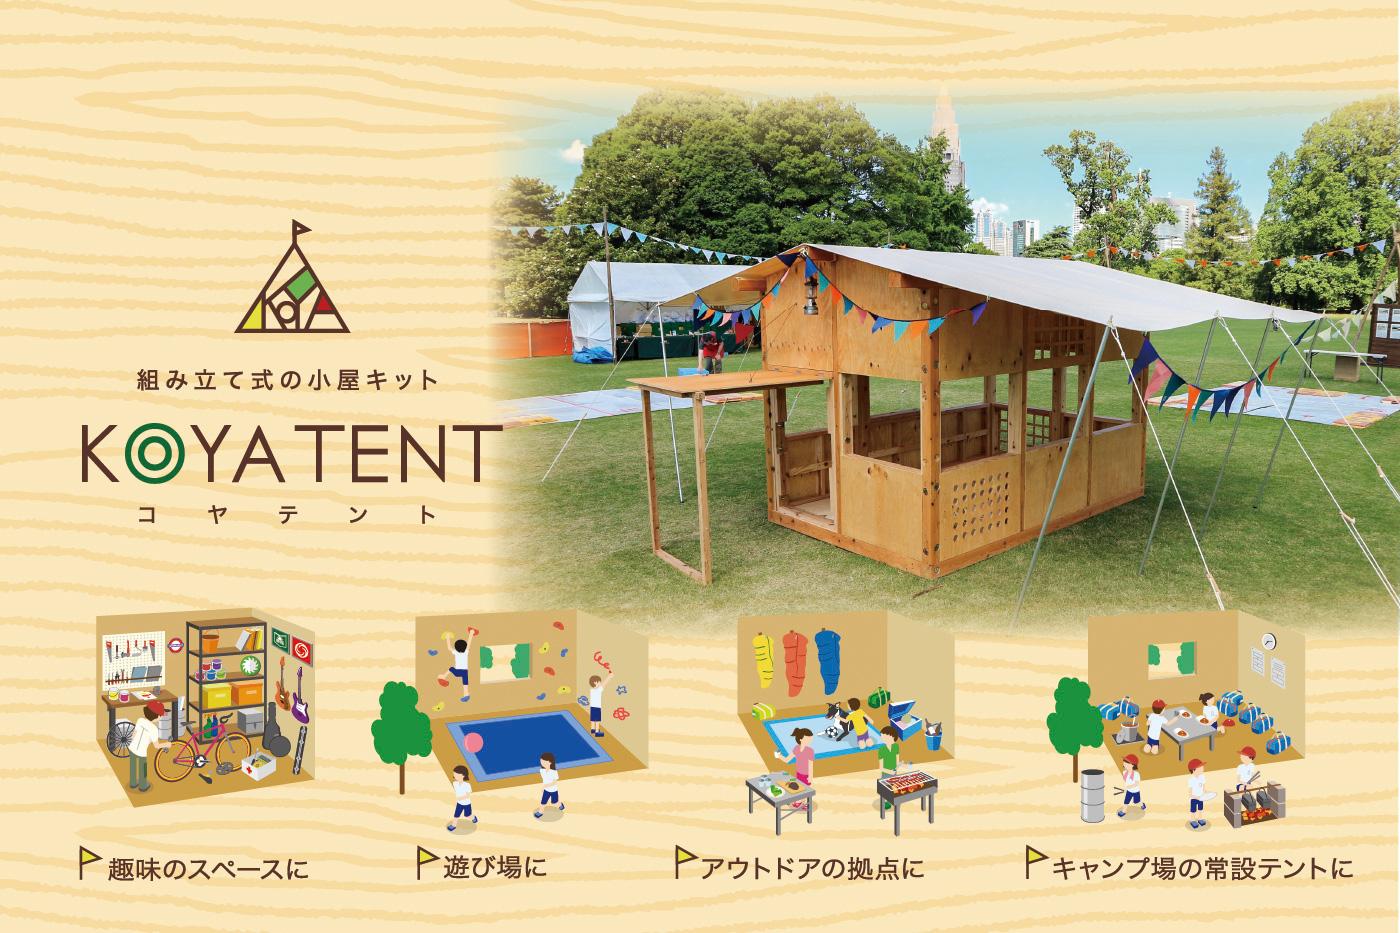 KOYATENT 組み立て式の小屋キット